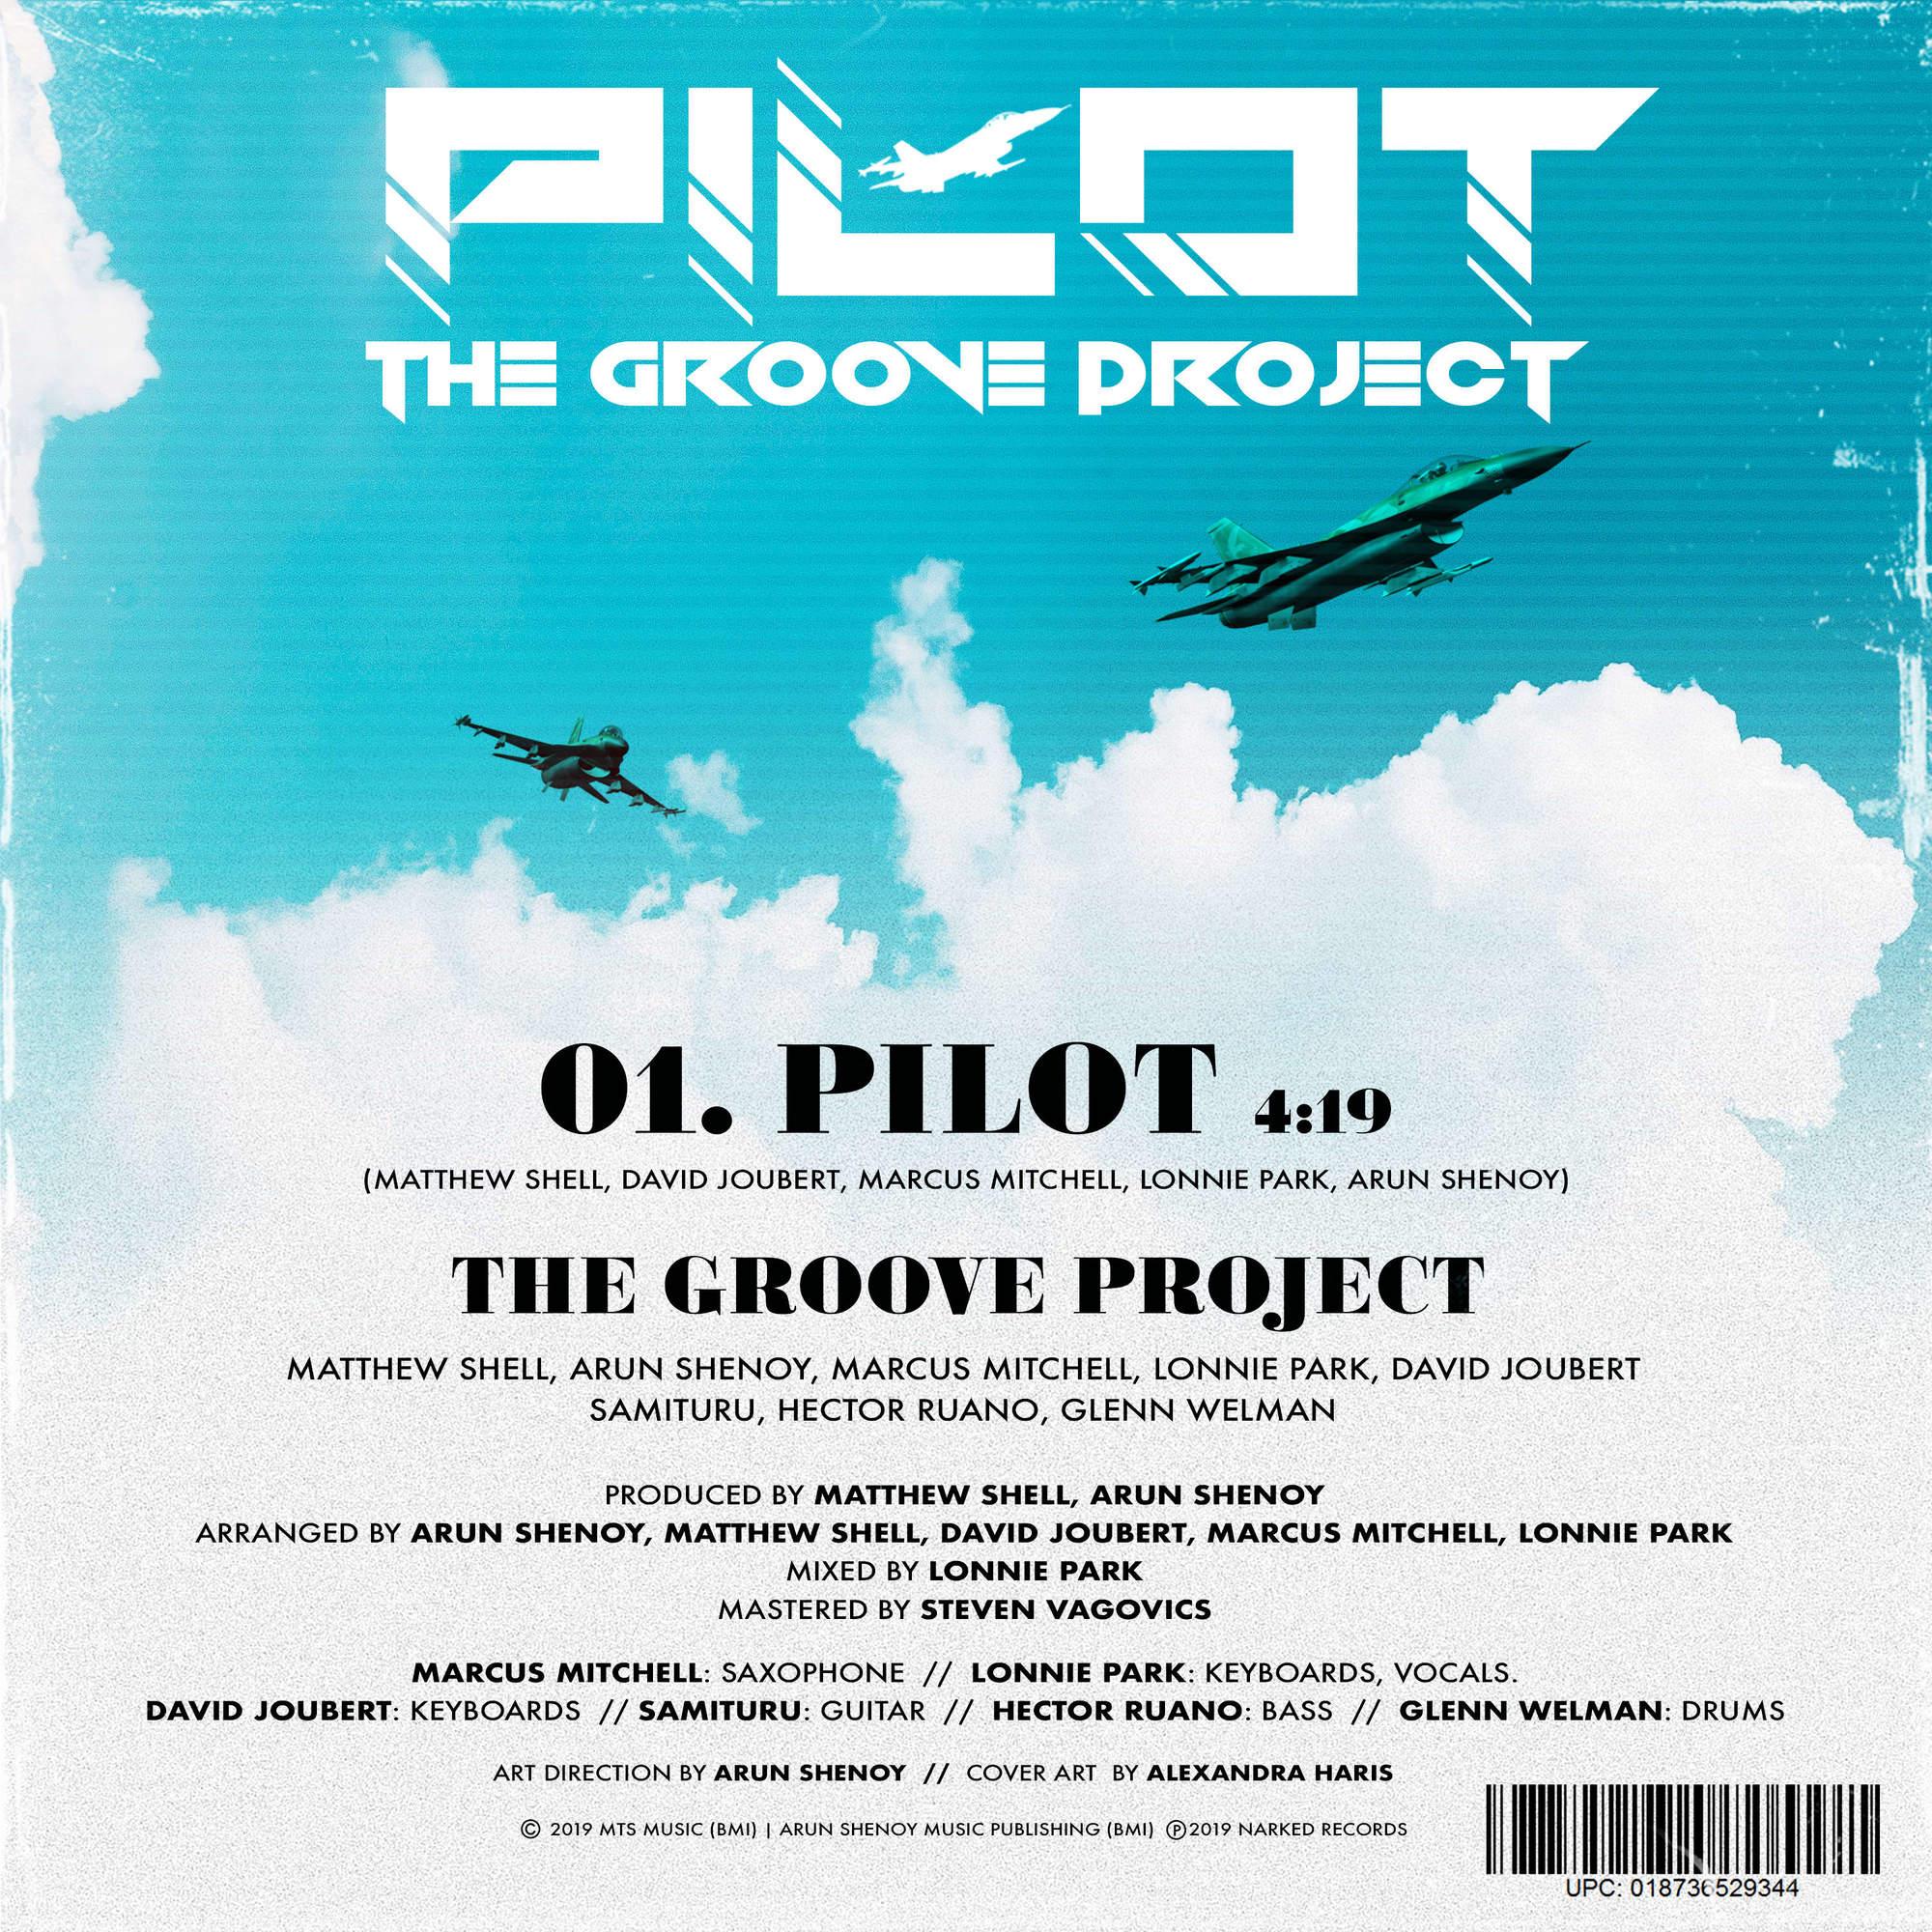 Pilot - Credits Sheet